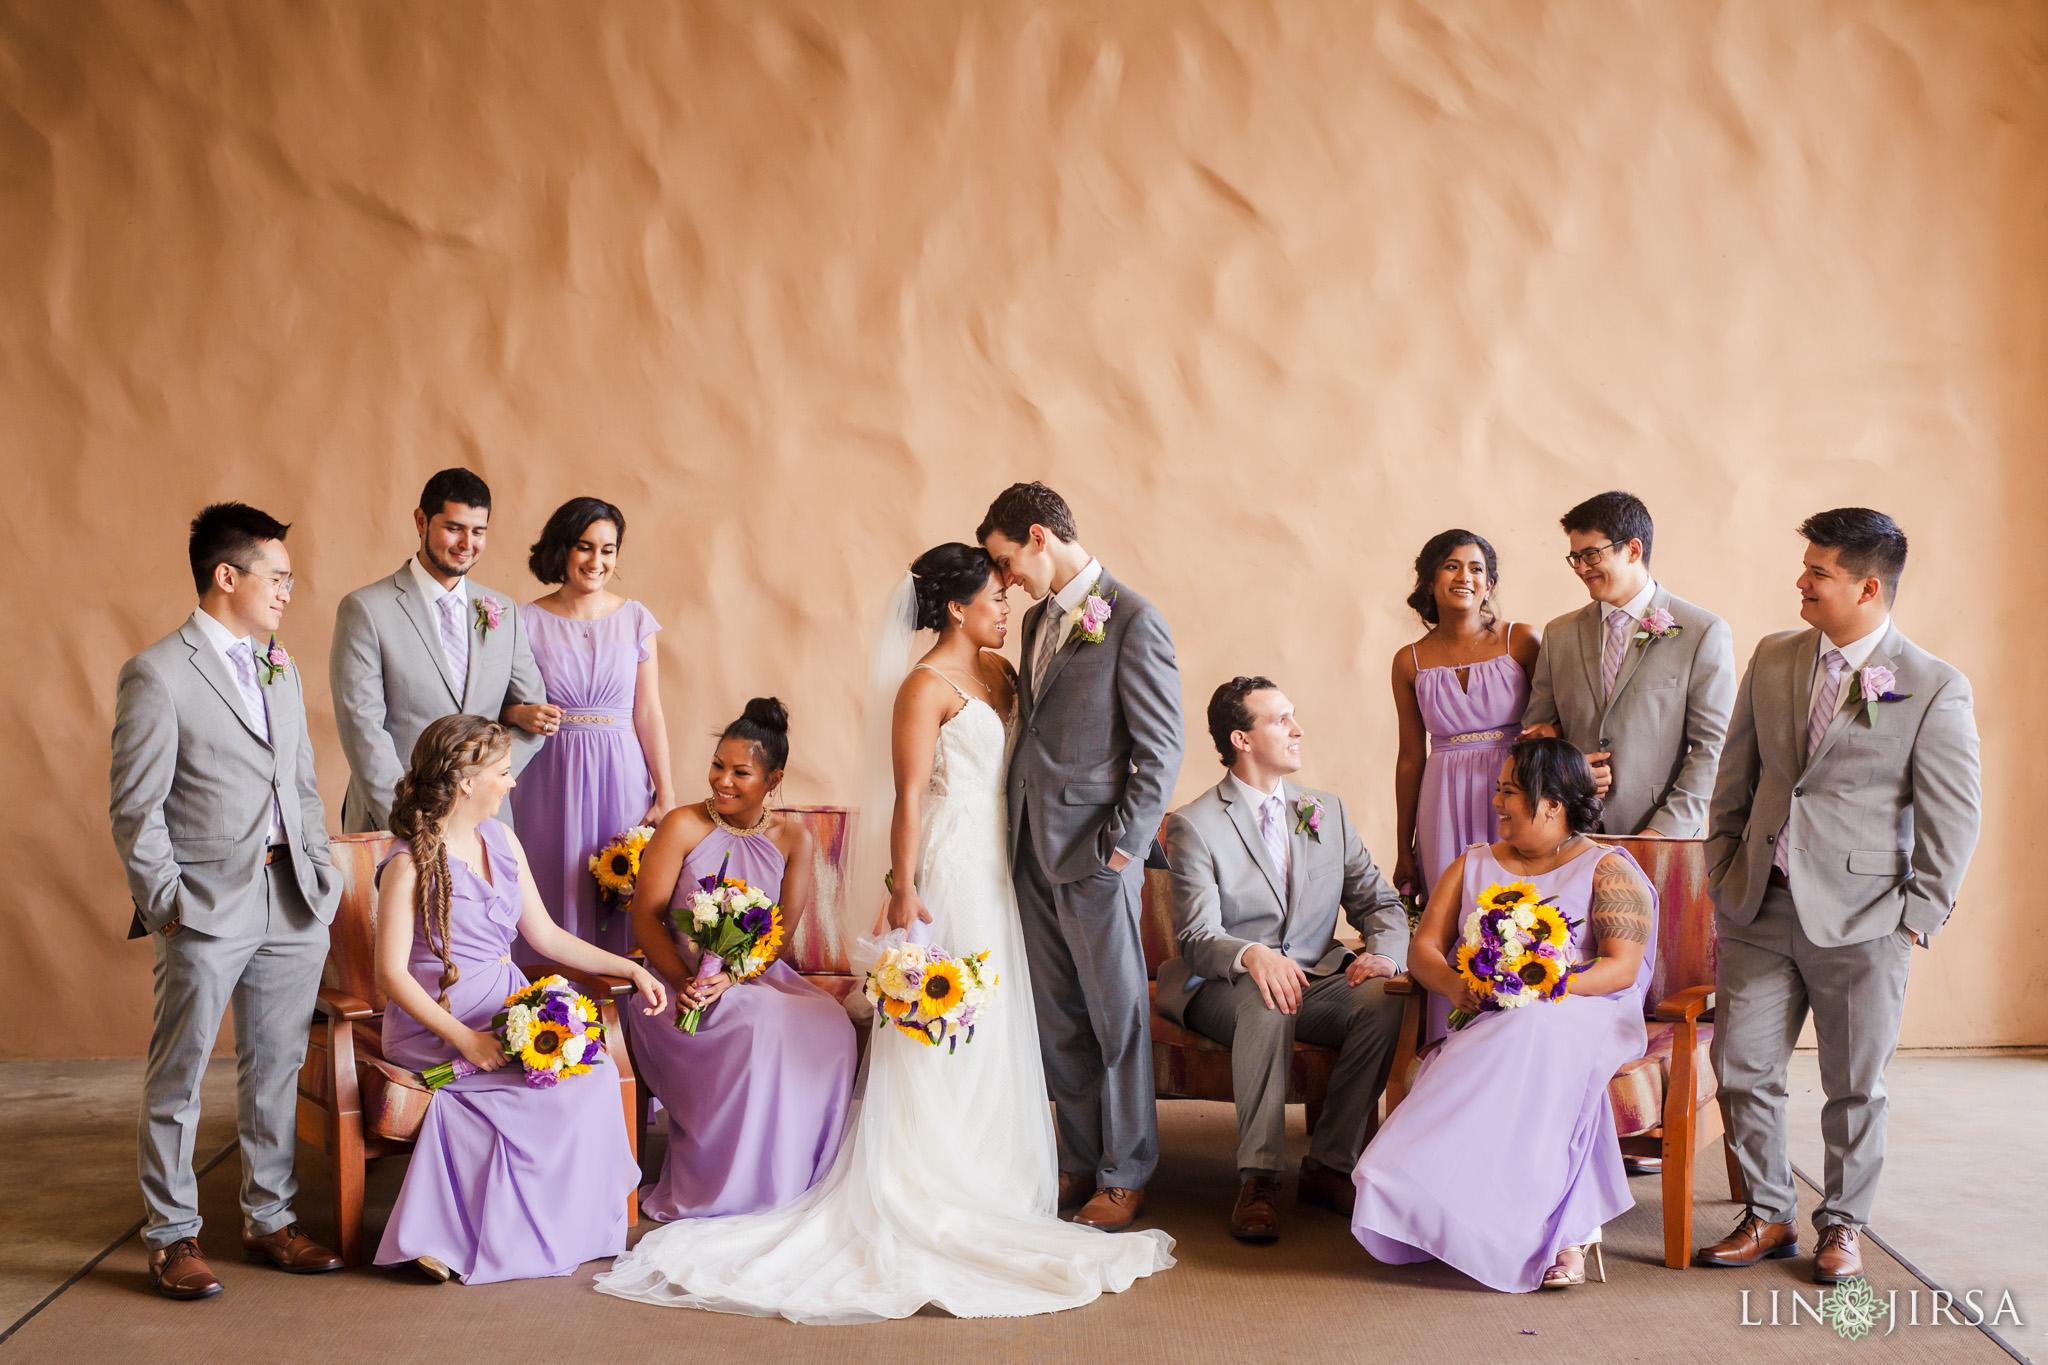 020 hyatt regency huntington beach wedding photography